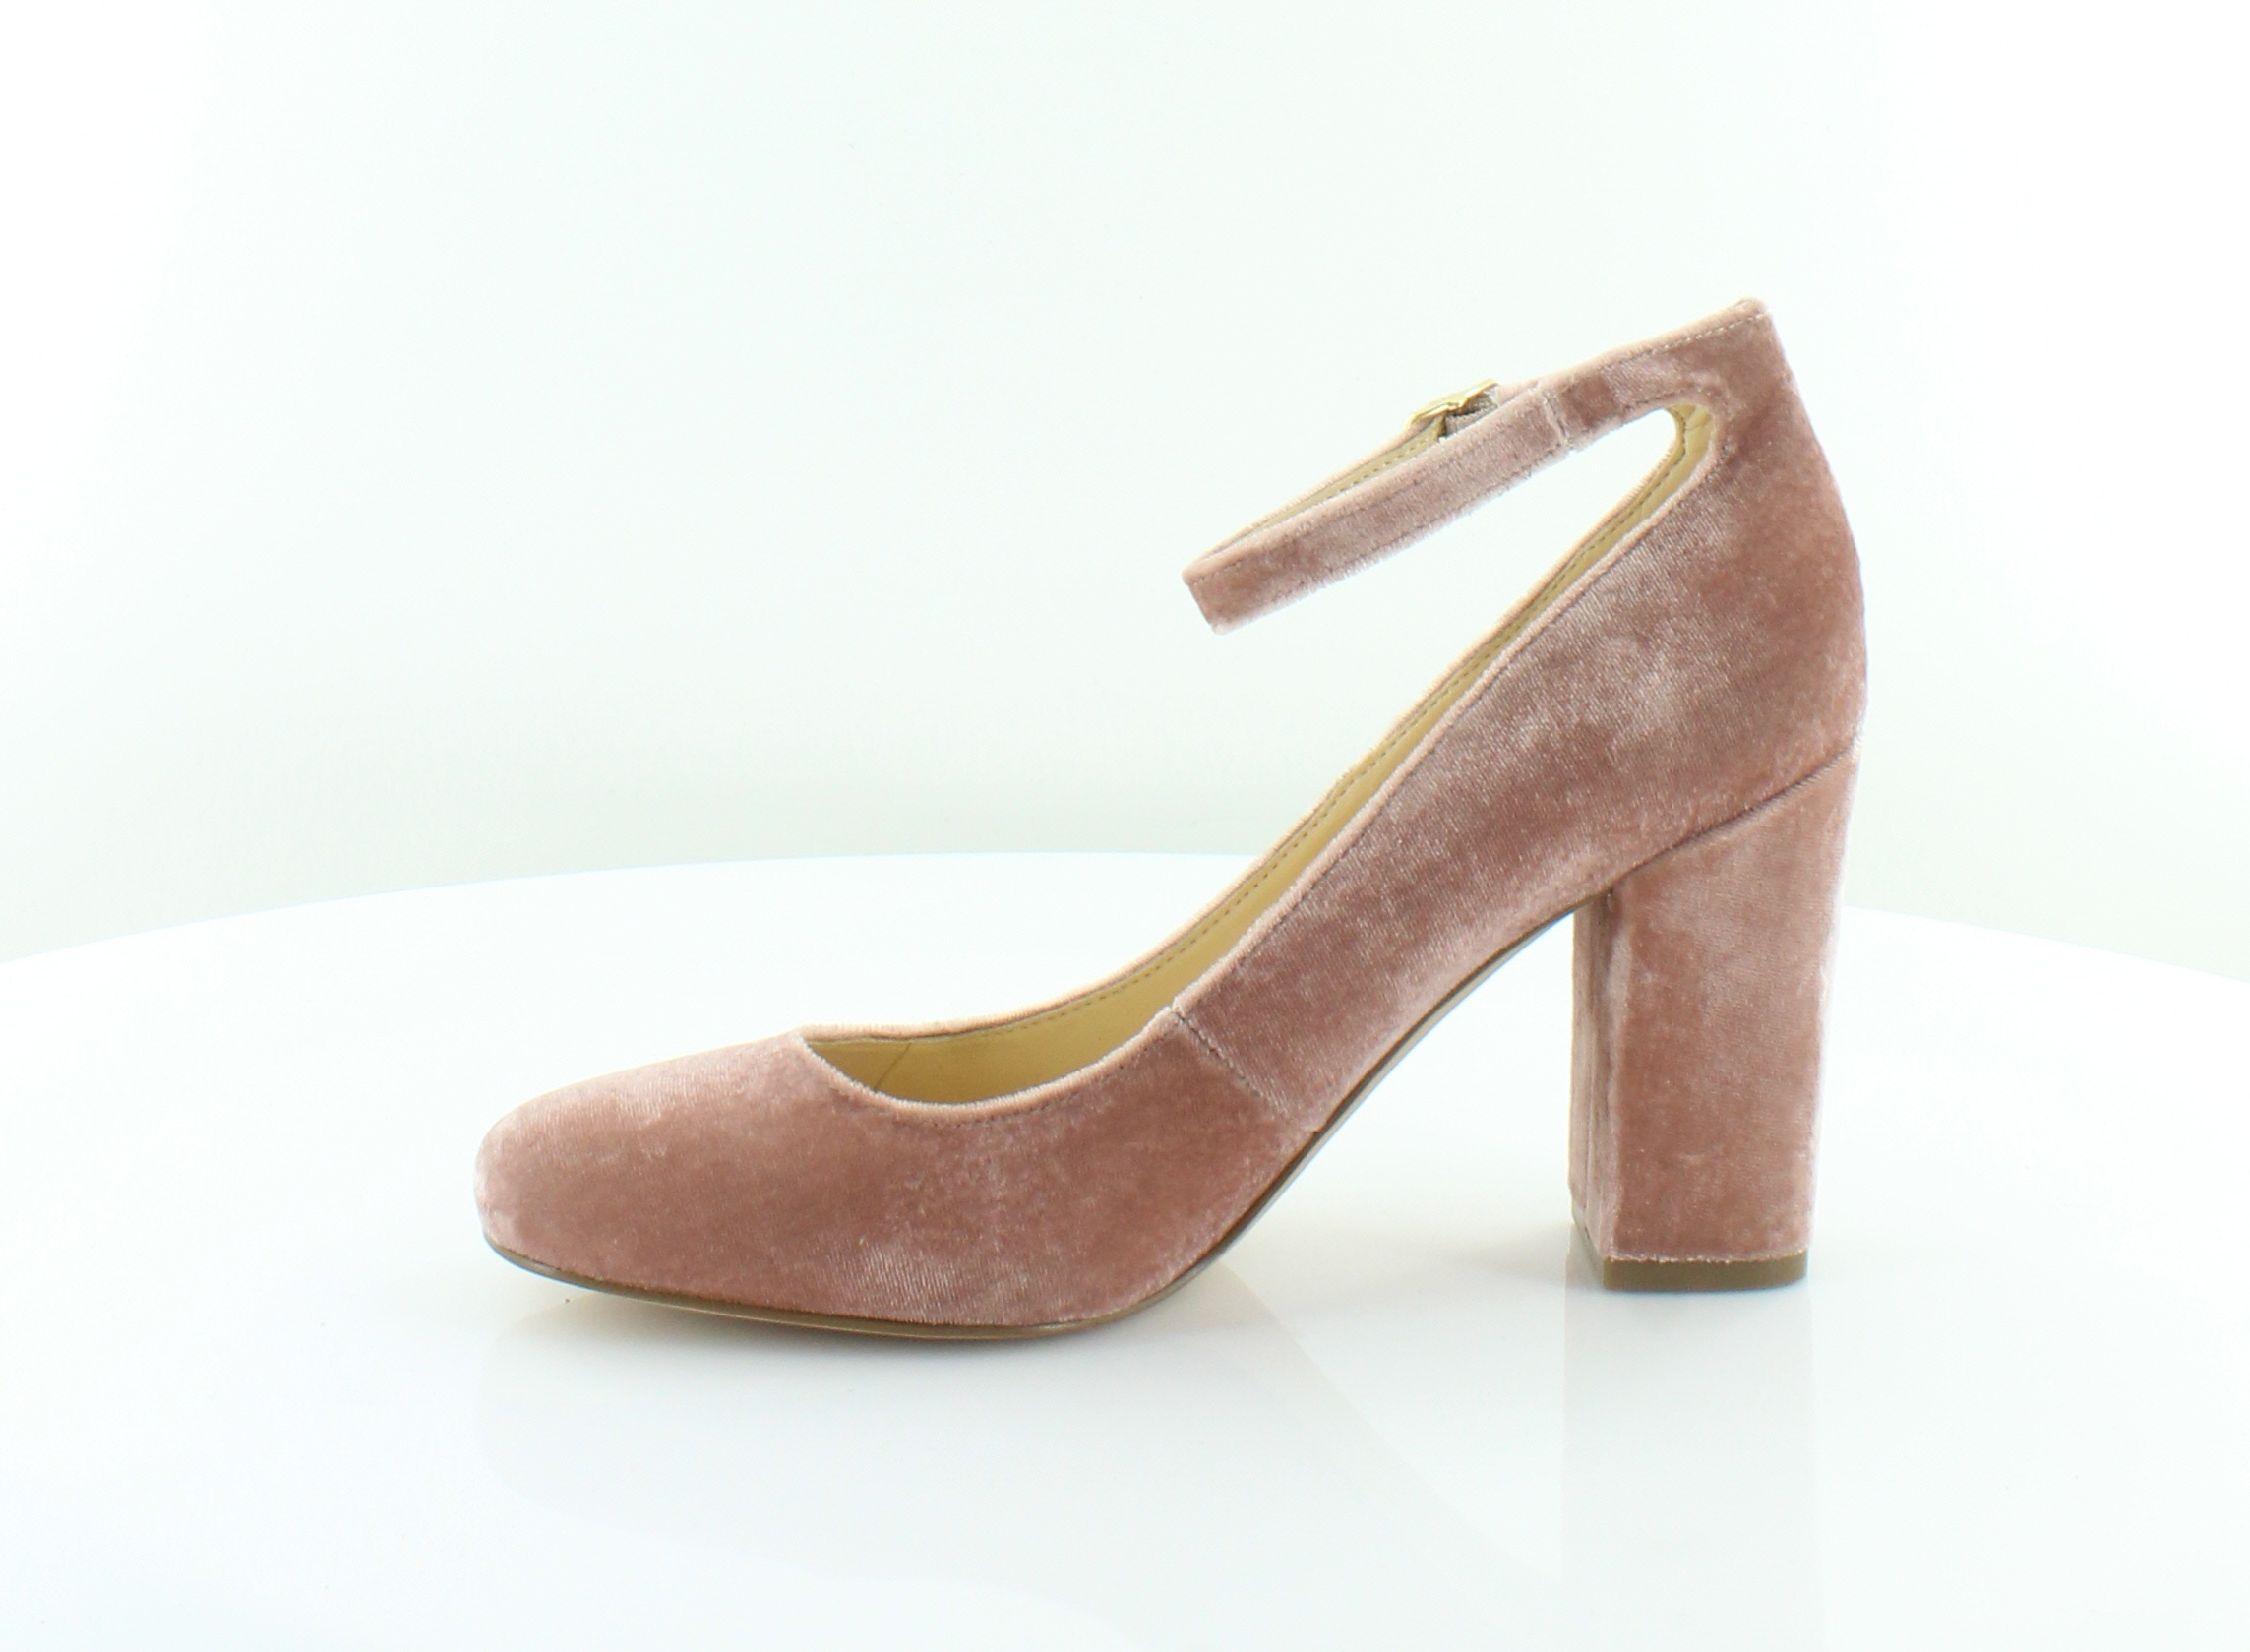 Ivanka Trump Heels Oasia Pink Damenschuhe Schuhes Größe 8 M Heels Trump MSRP 130 c435e6